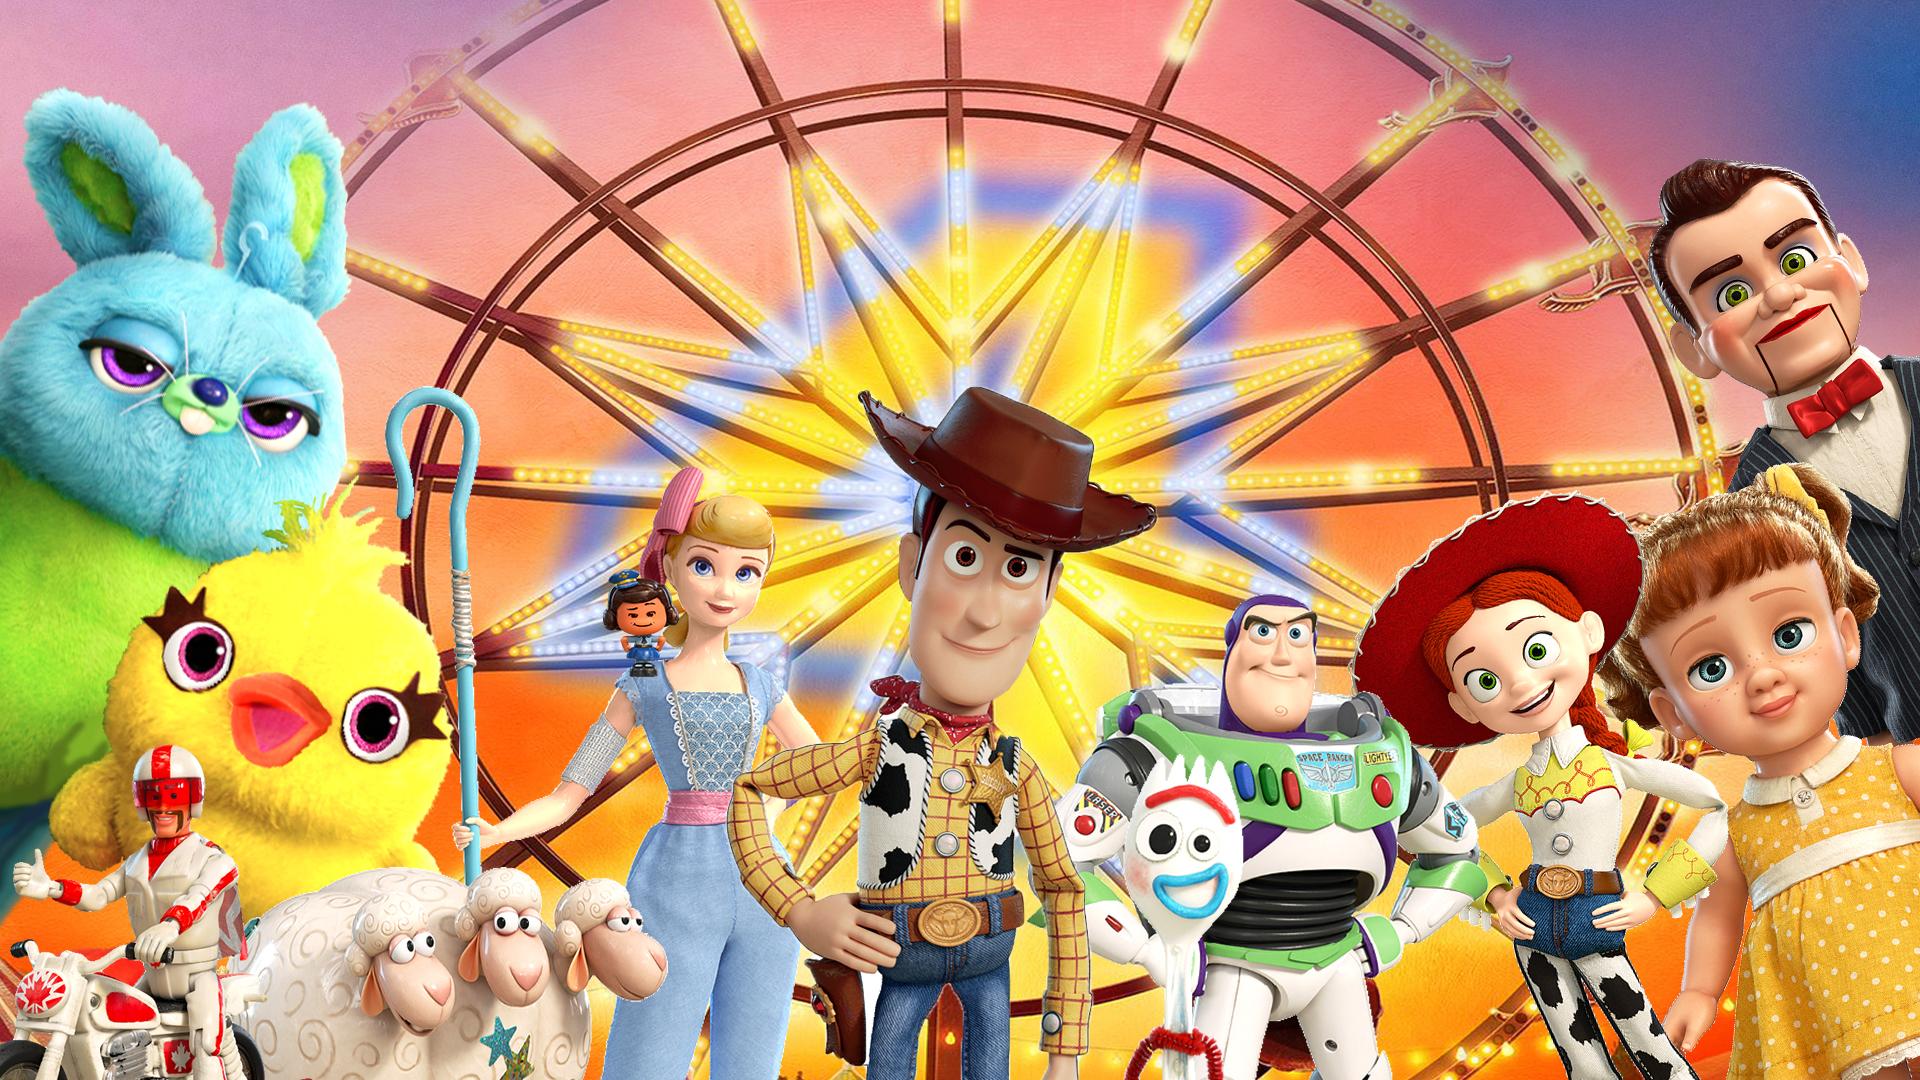 Toy Story 4 Wallpaper by The-Dark-Mamba-995 on DeviantArt